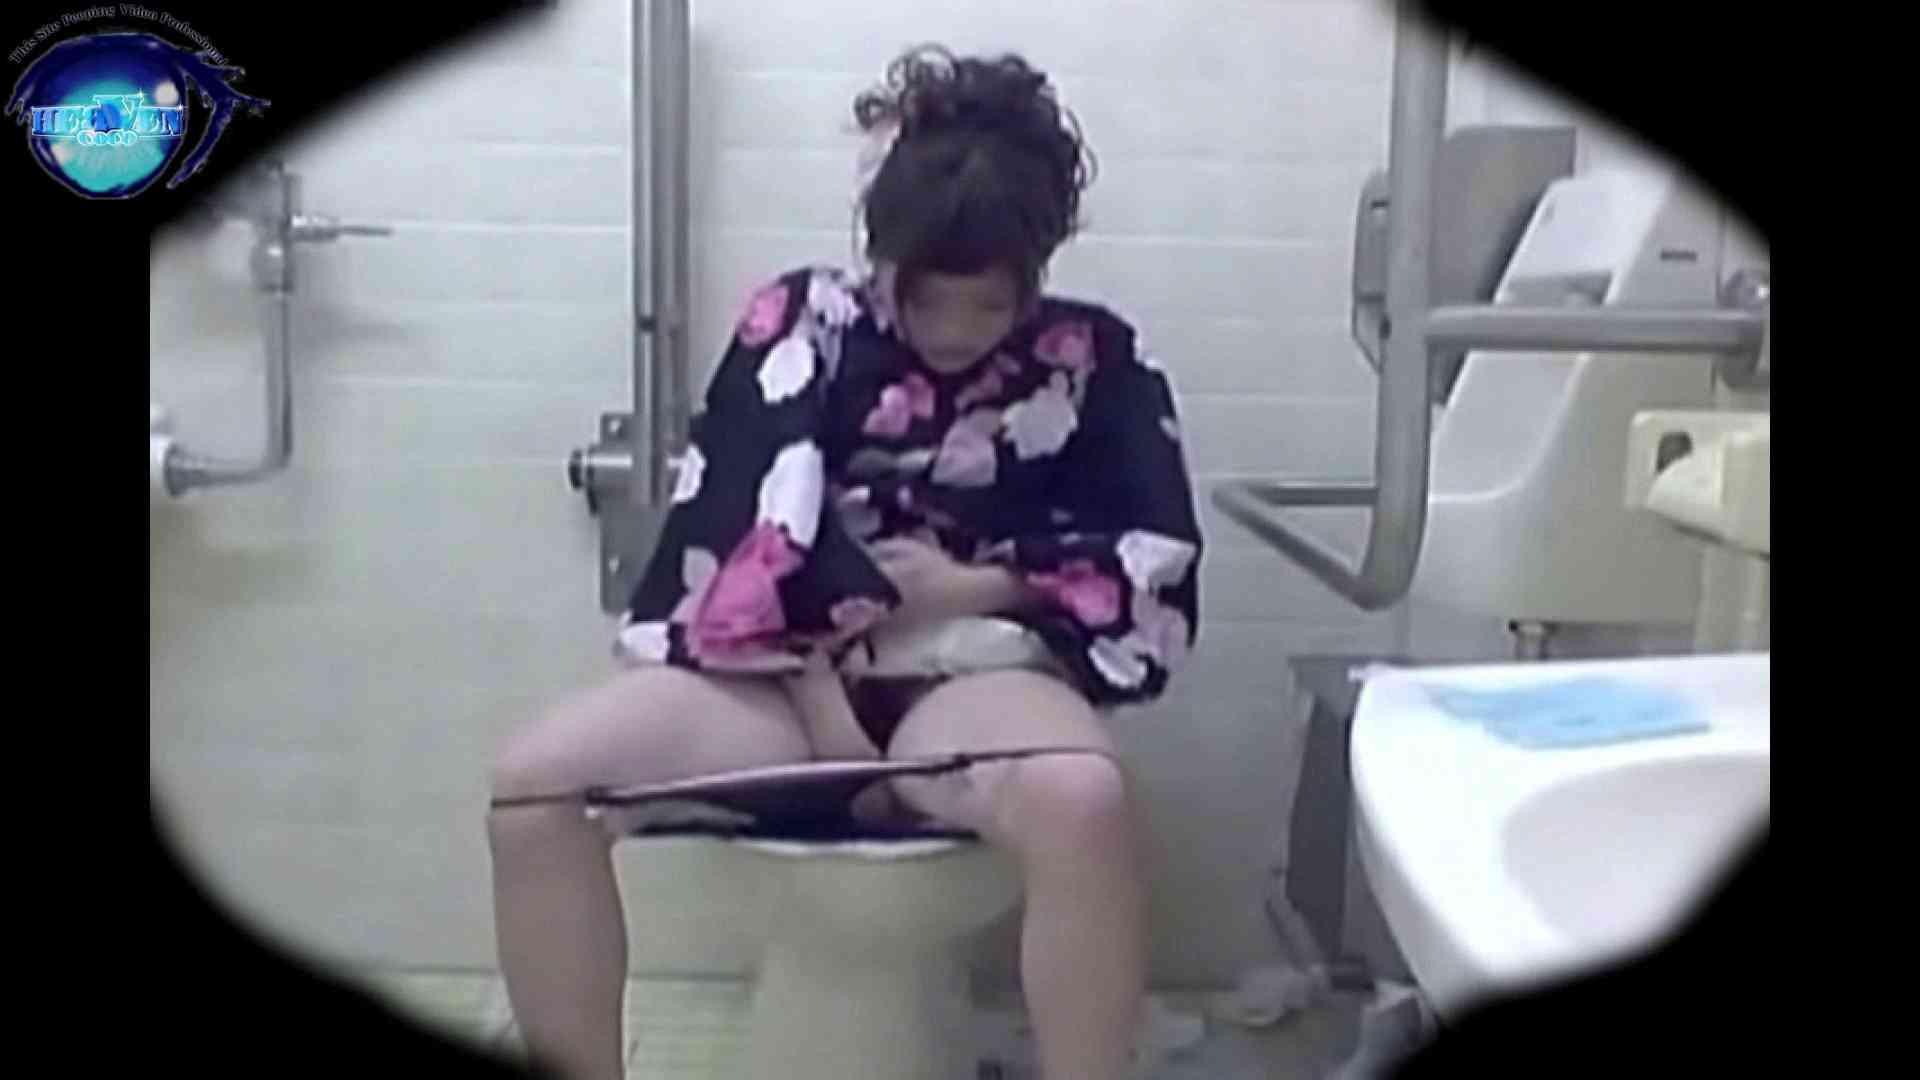 teen galトイレ覗き紙がナイ編‼vol.17 OLのエロ生活 えろ無修正画像 52連発 18